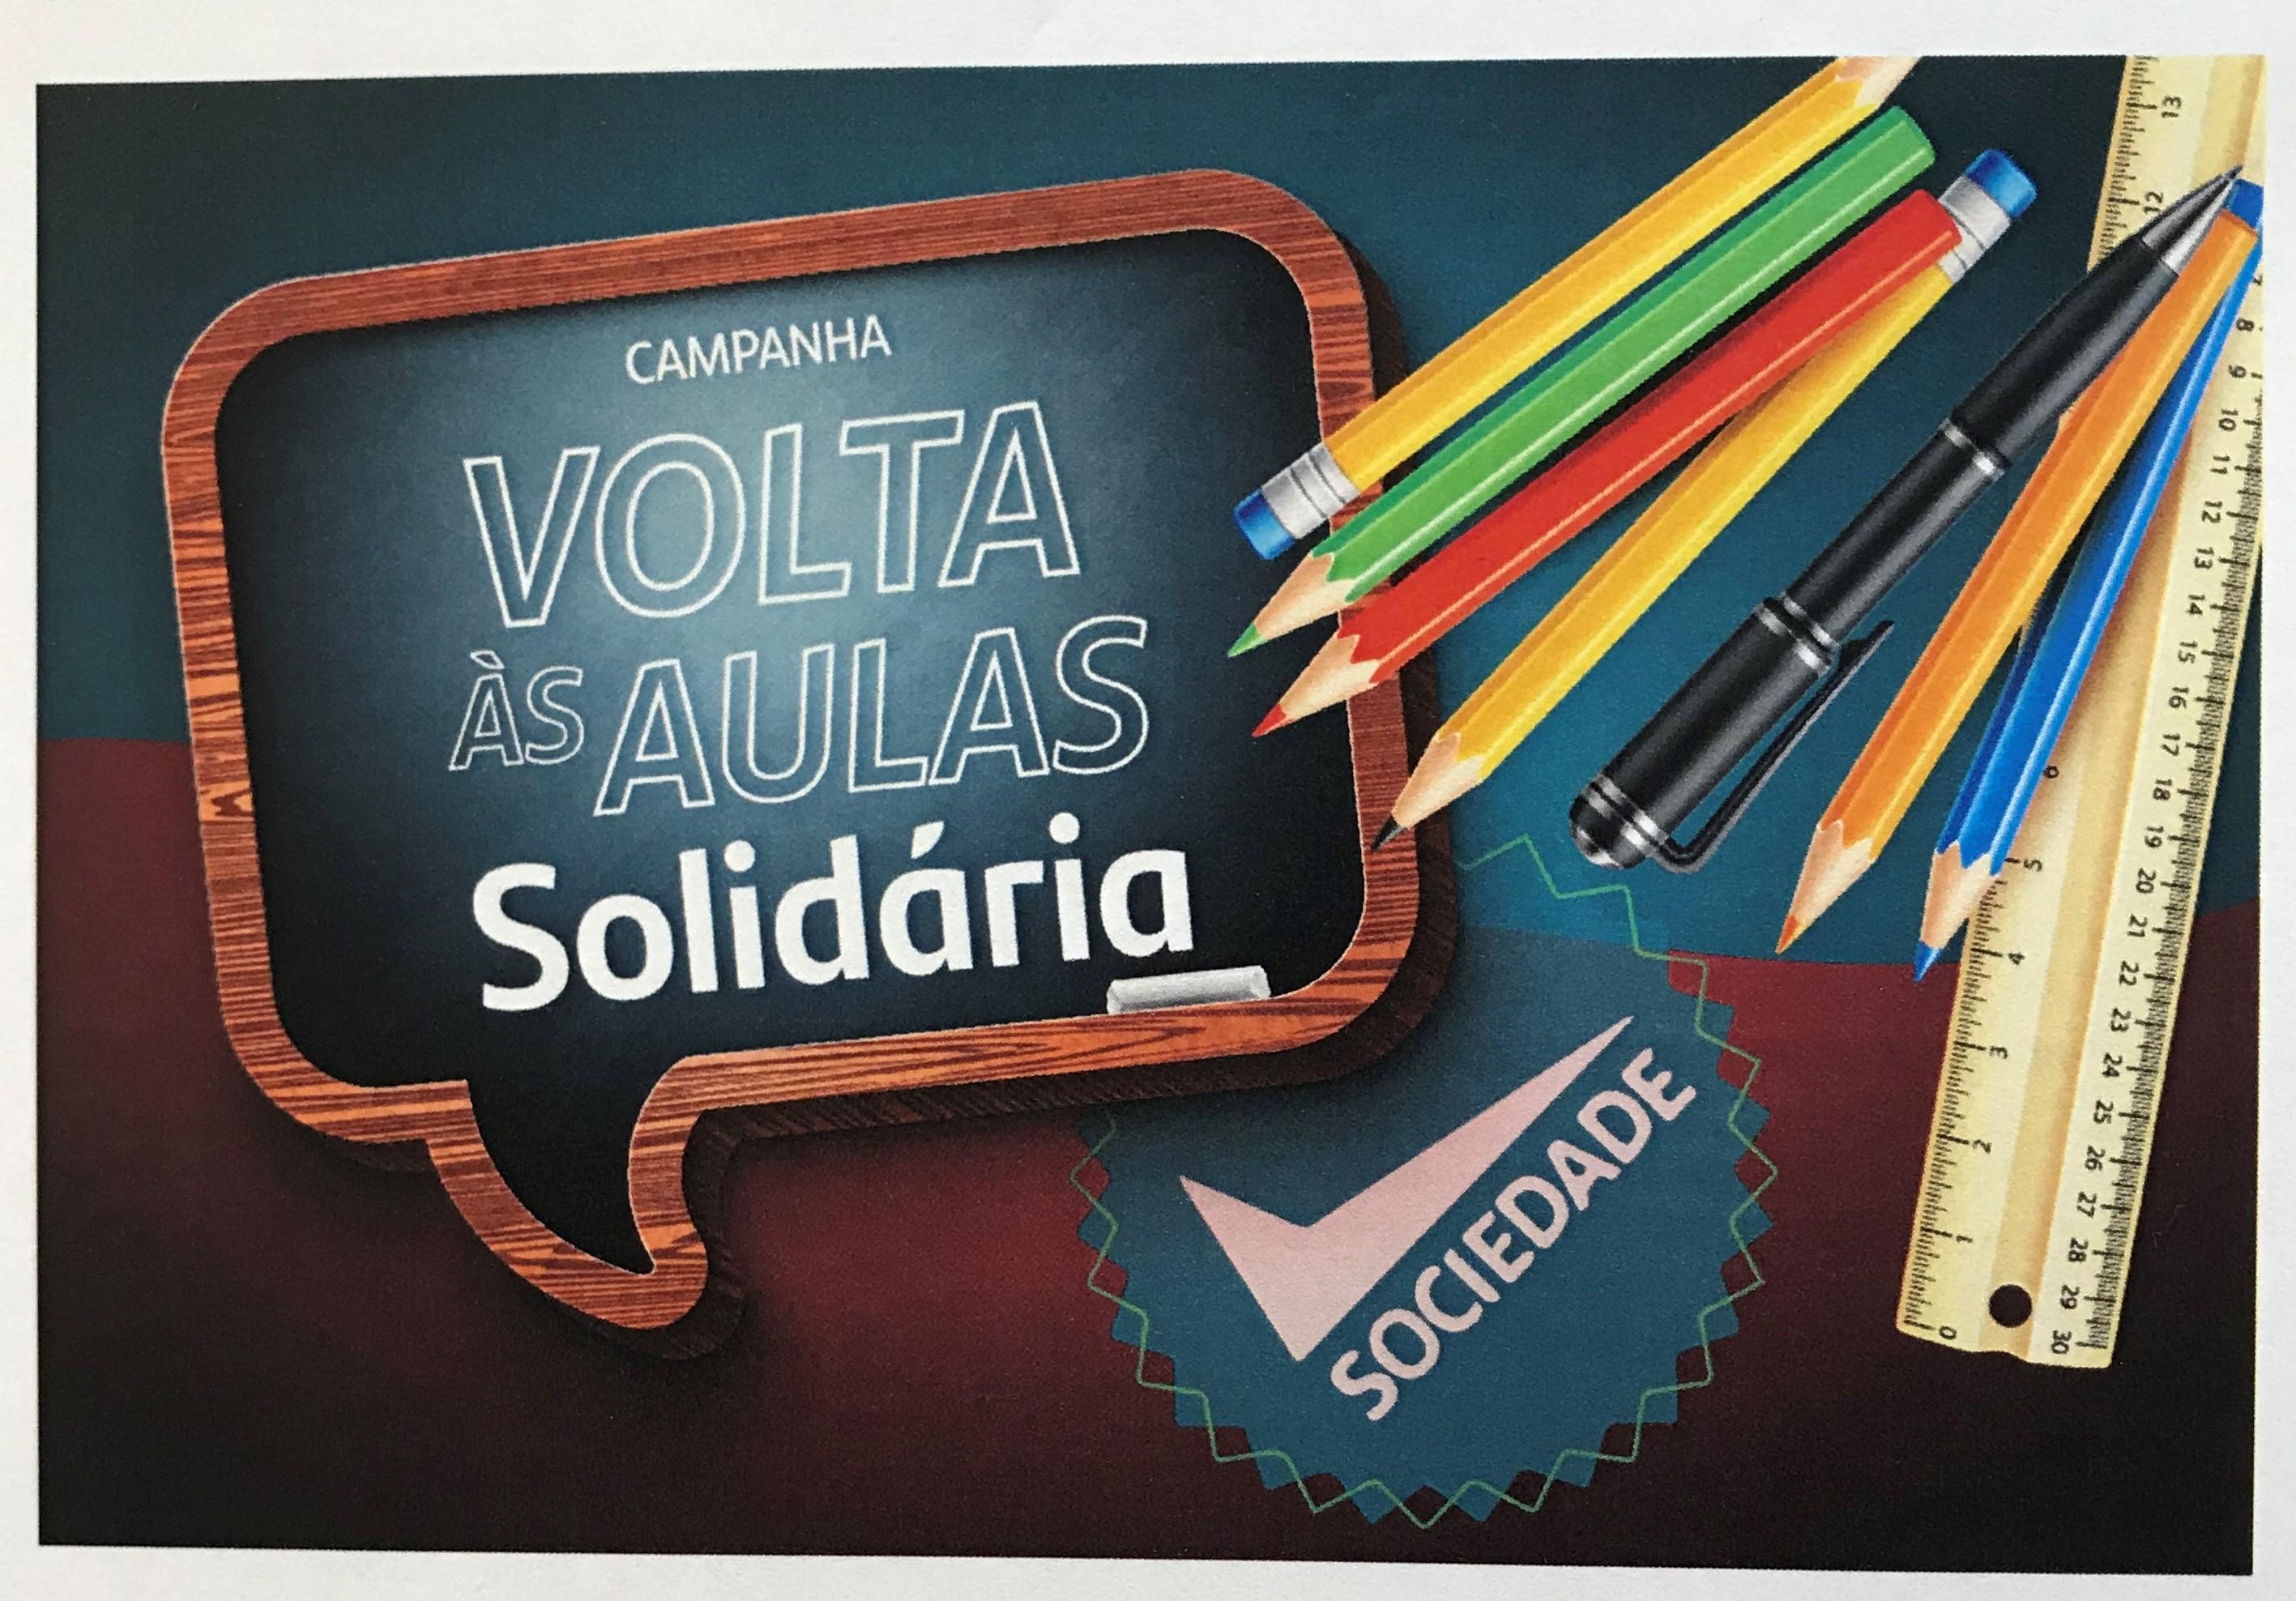 Volta as Aulas Solidária - AG SHOP DOWNTOWN - RJ 2247